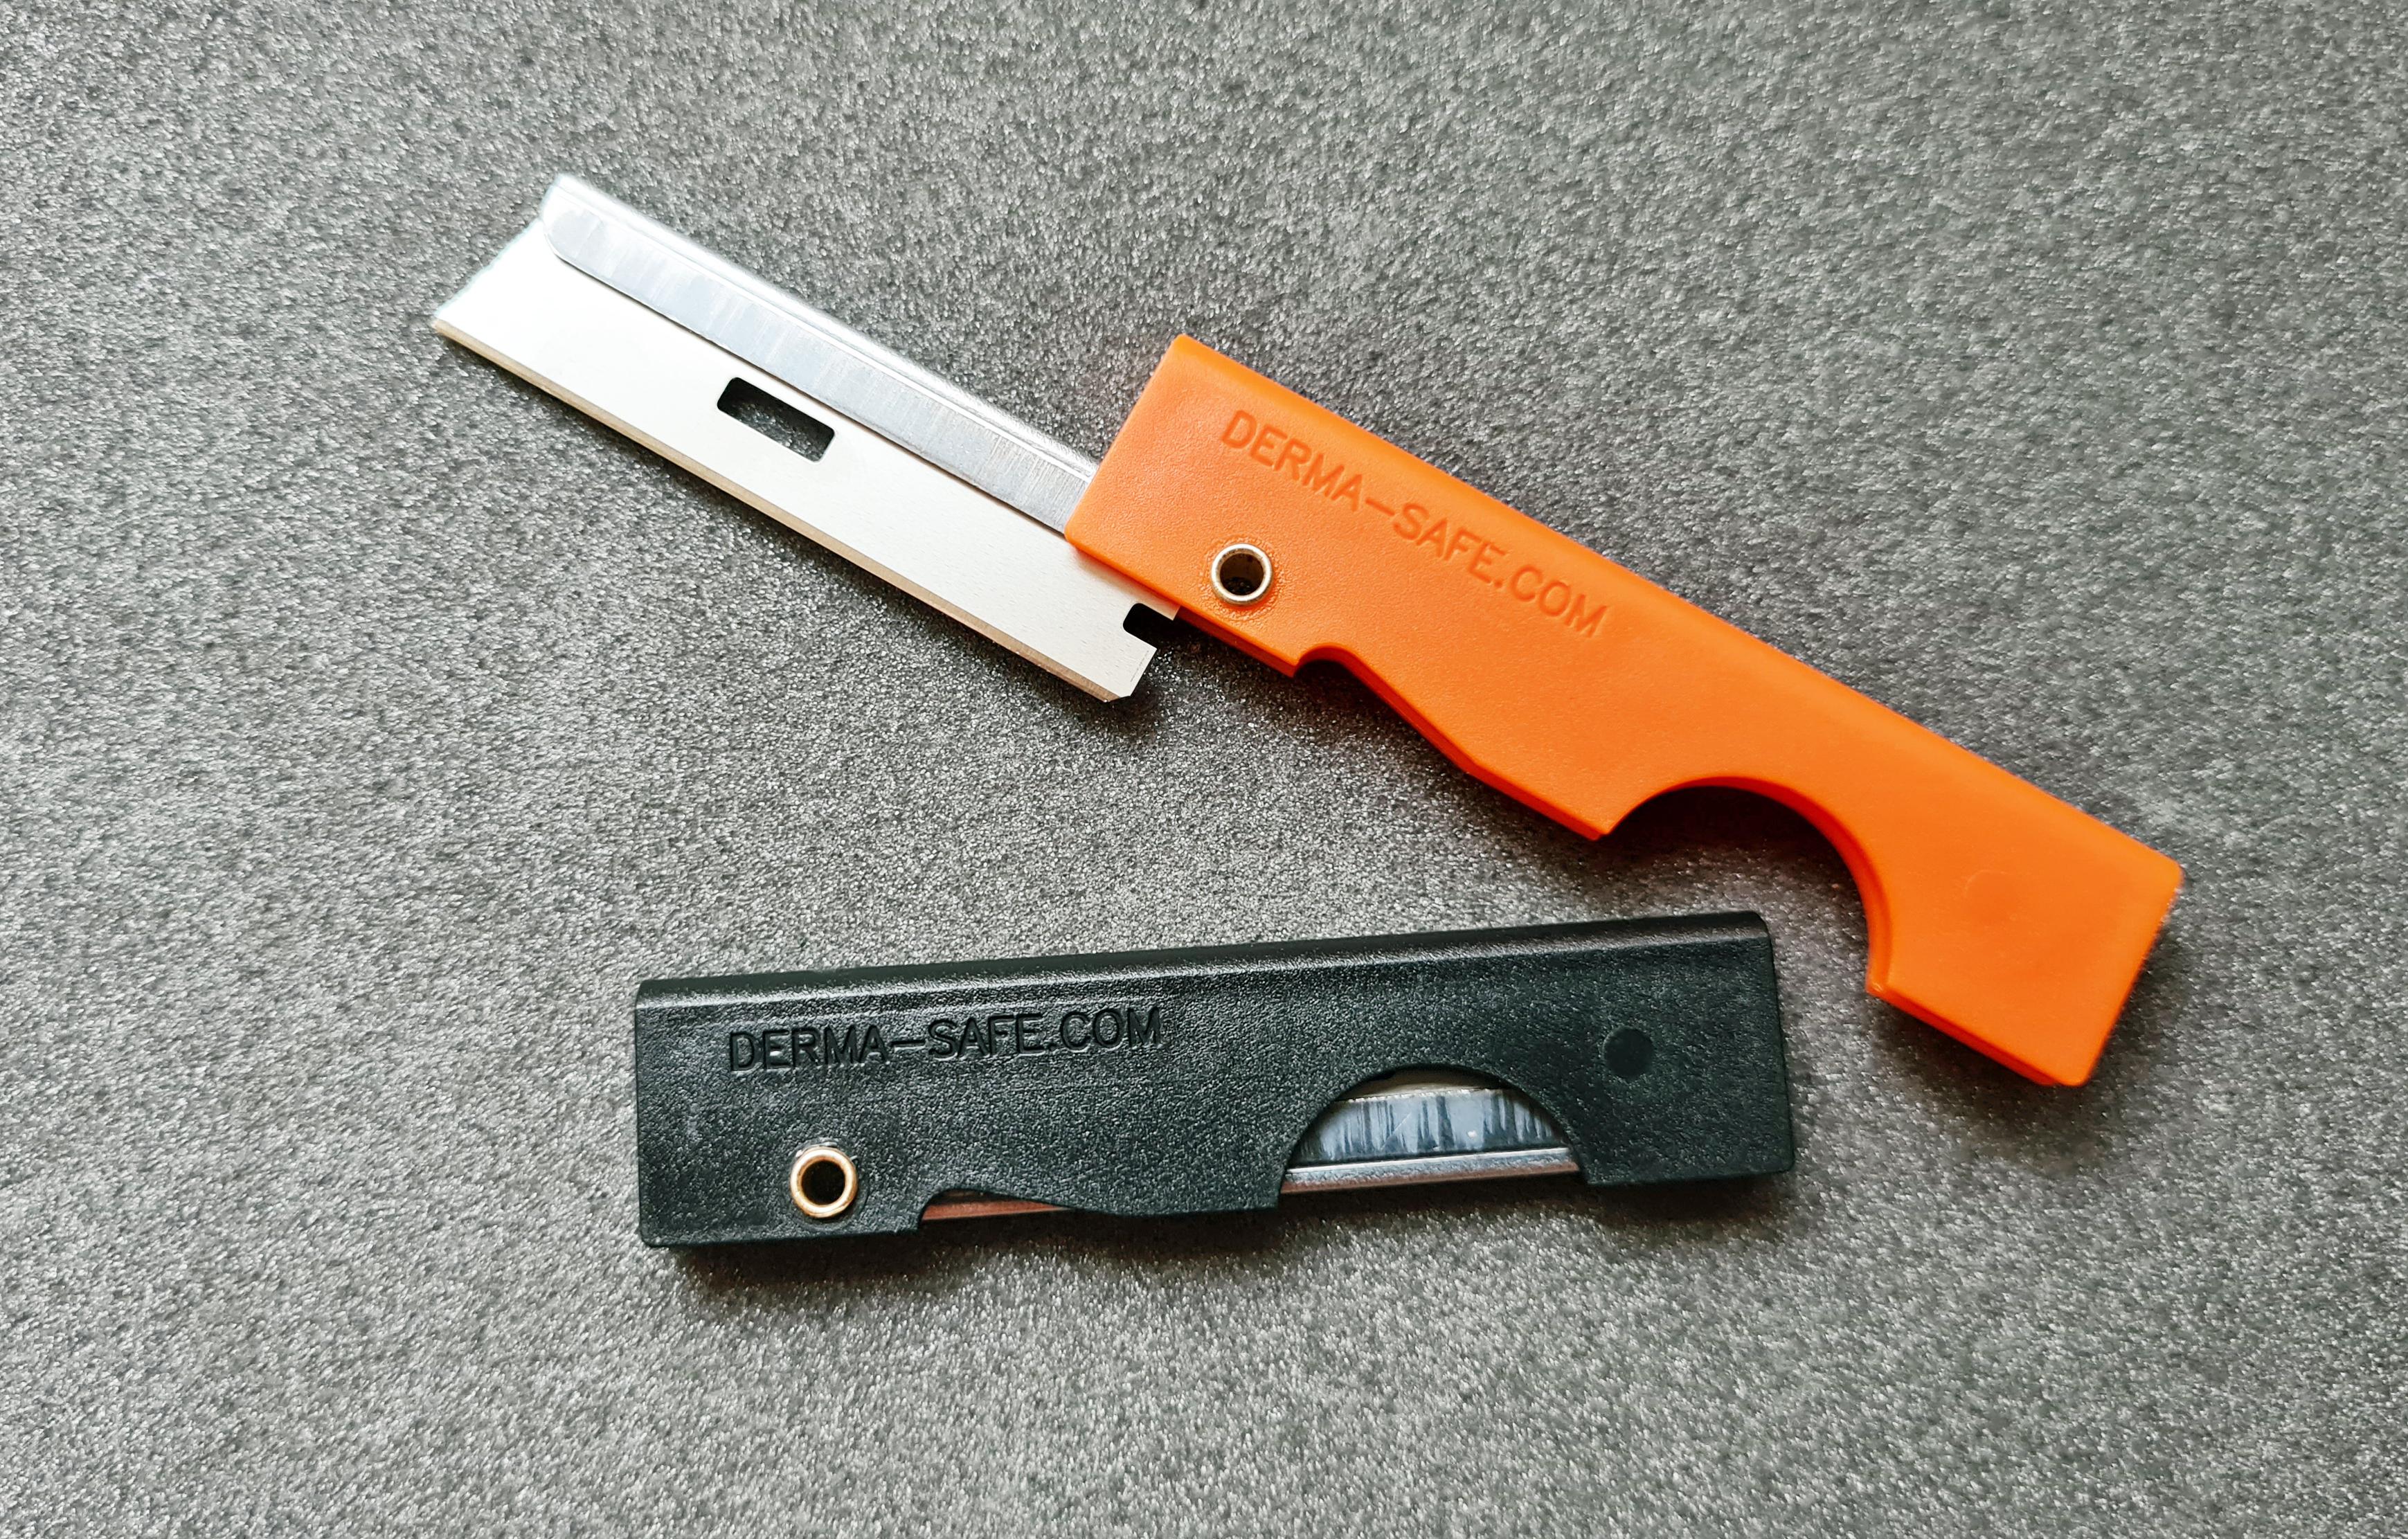 Black and orange handled Derma-Safe razors